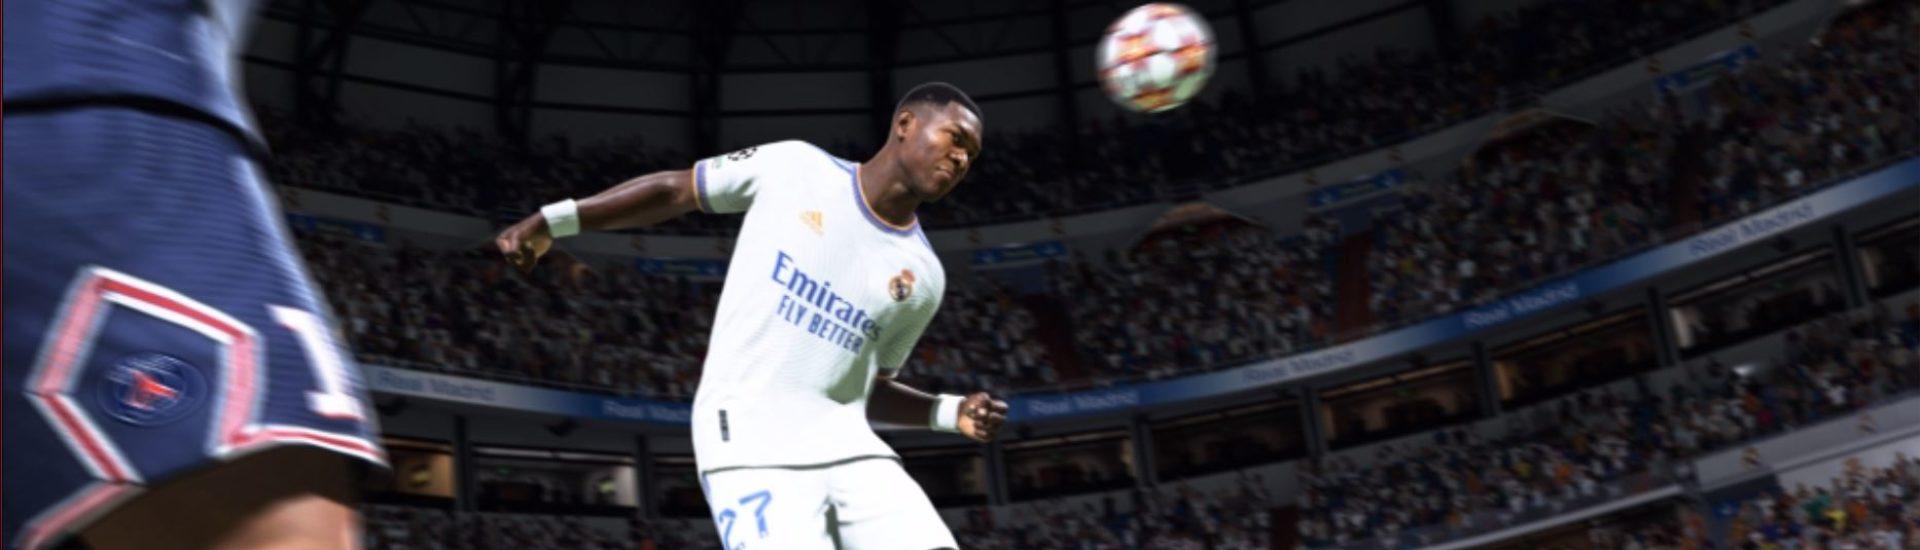 FIFA 22: Erstes Gameplay offenbart gelungene Hypermotion-Technologie